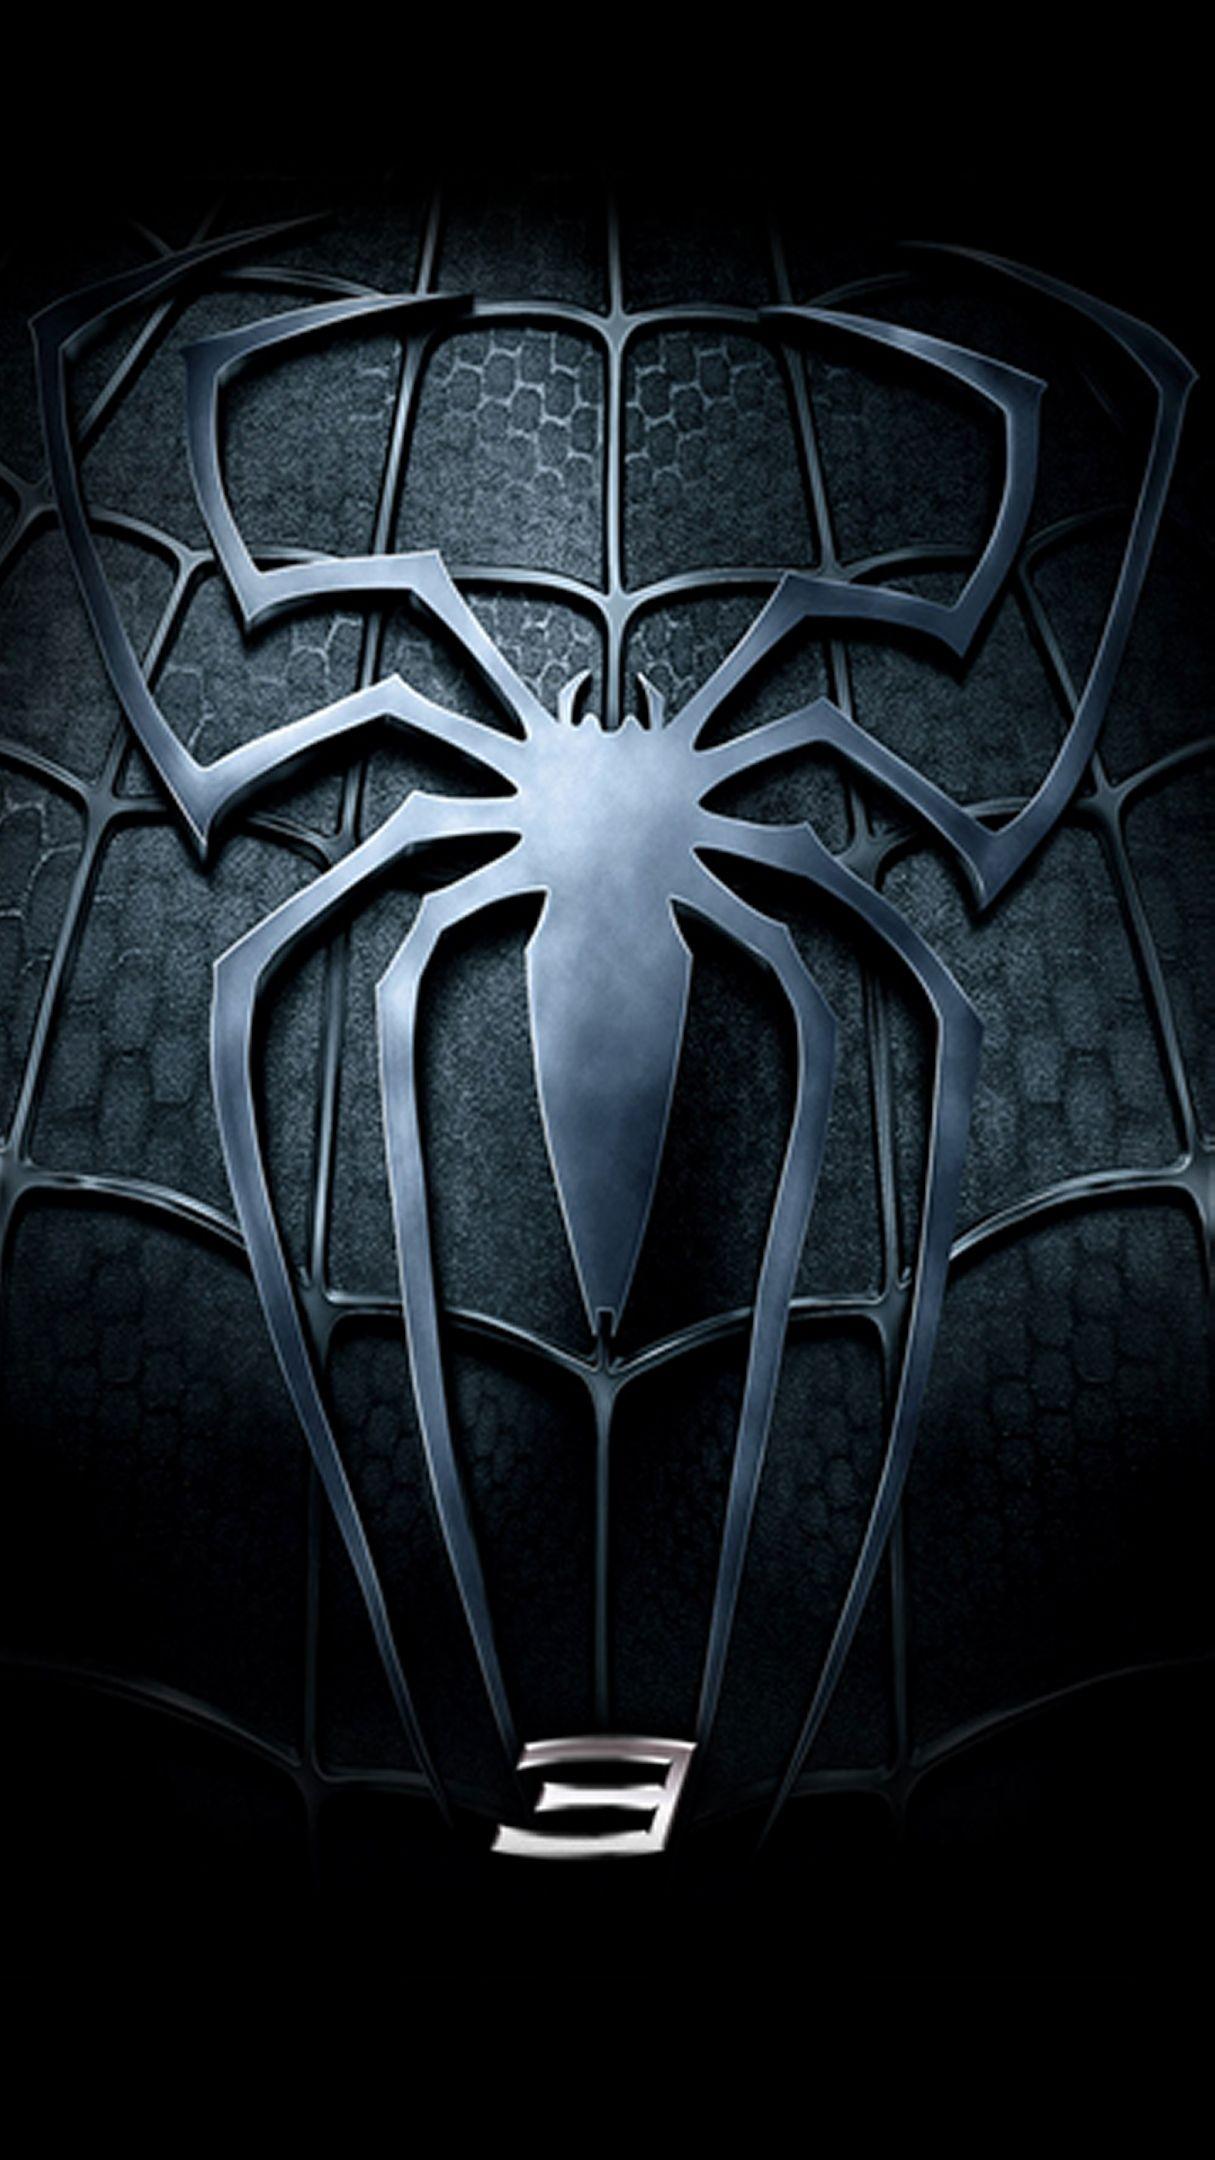 خلفيات 4k للايفون Wallpaper Iphone Xs Tecnologis Digital Wallpaper Spiderman Android Wallpaper